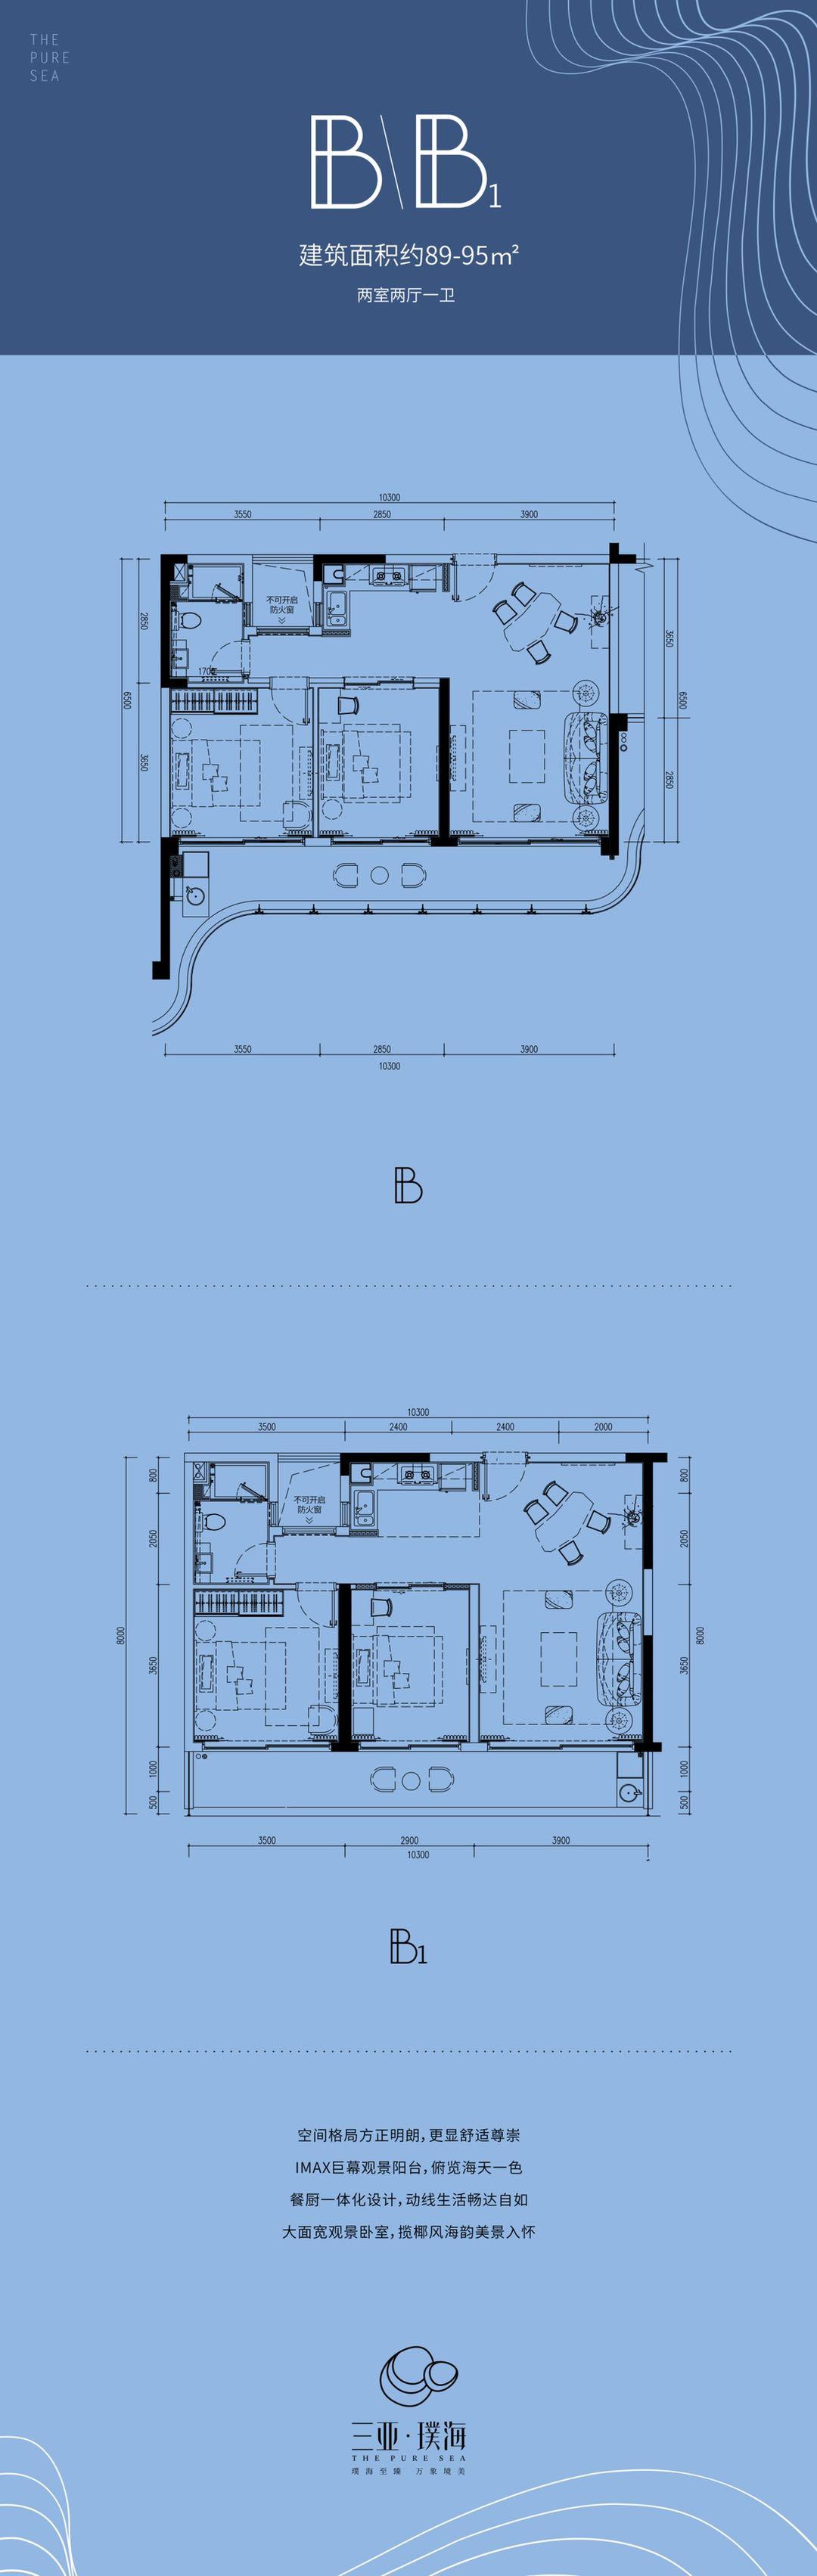 B-B1户型两室两厅一卫